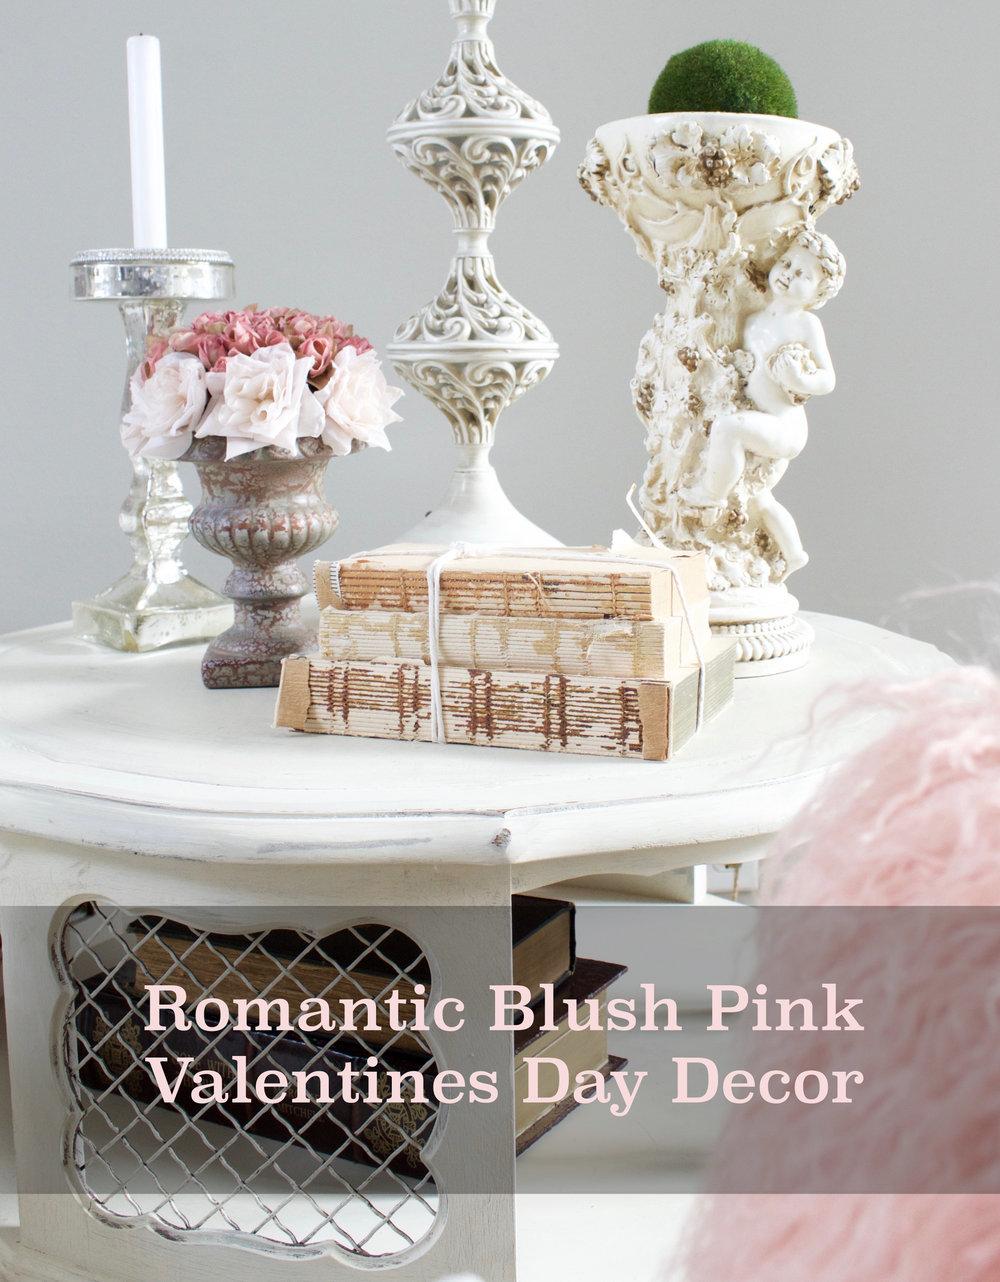 Romantic Blush Pink Valentines Day Decor